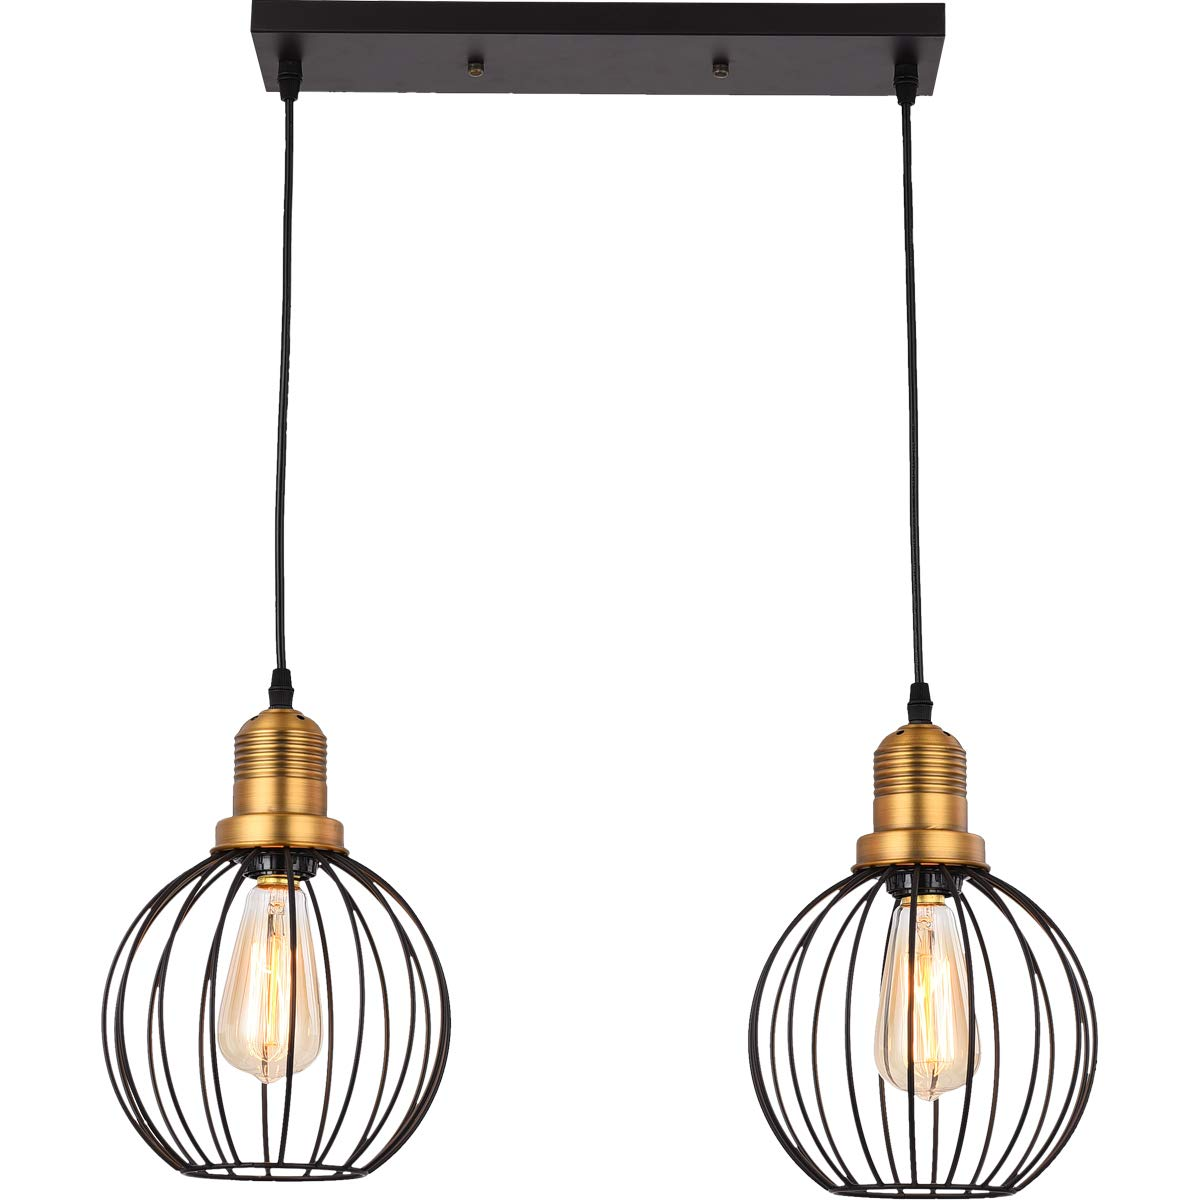 Pendant Light HOXIYA Hanging Ceiling Light Fixture PL1904